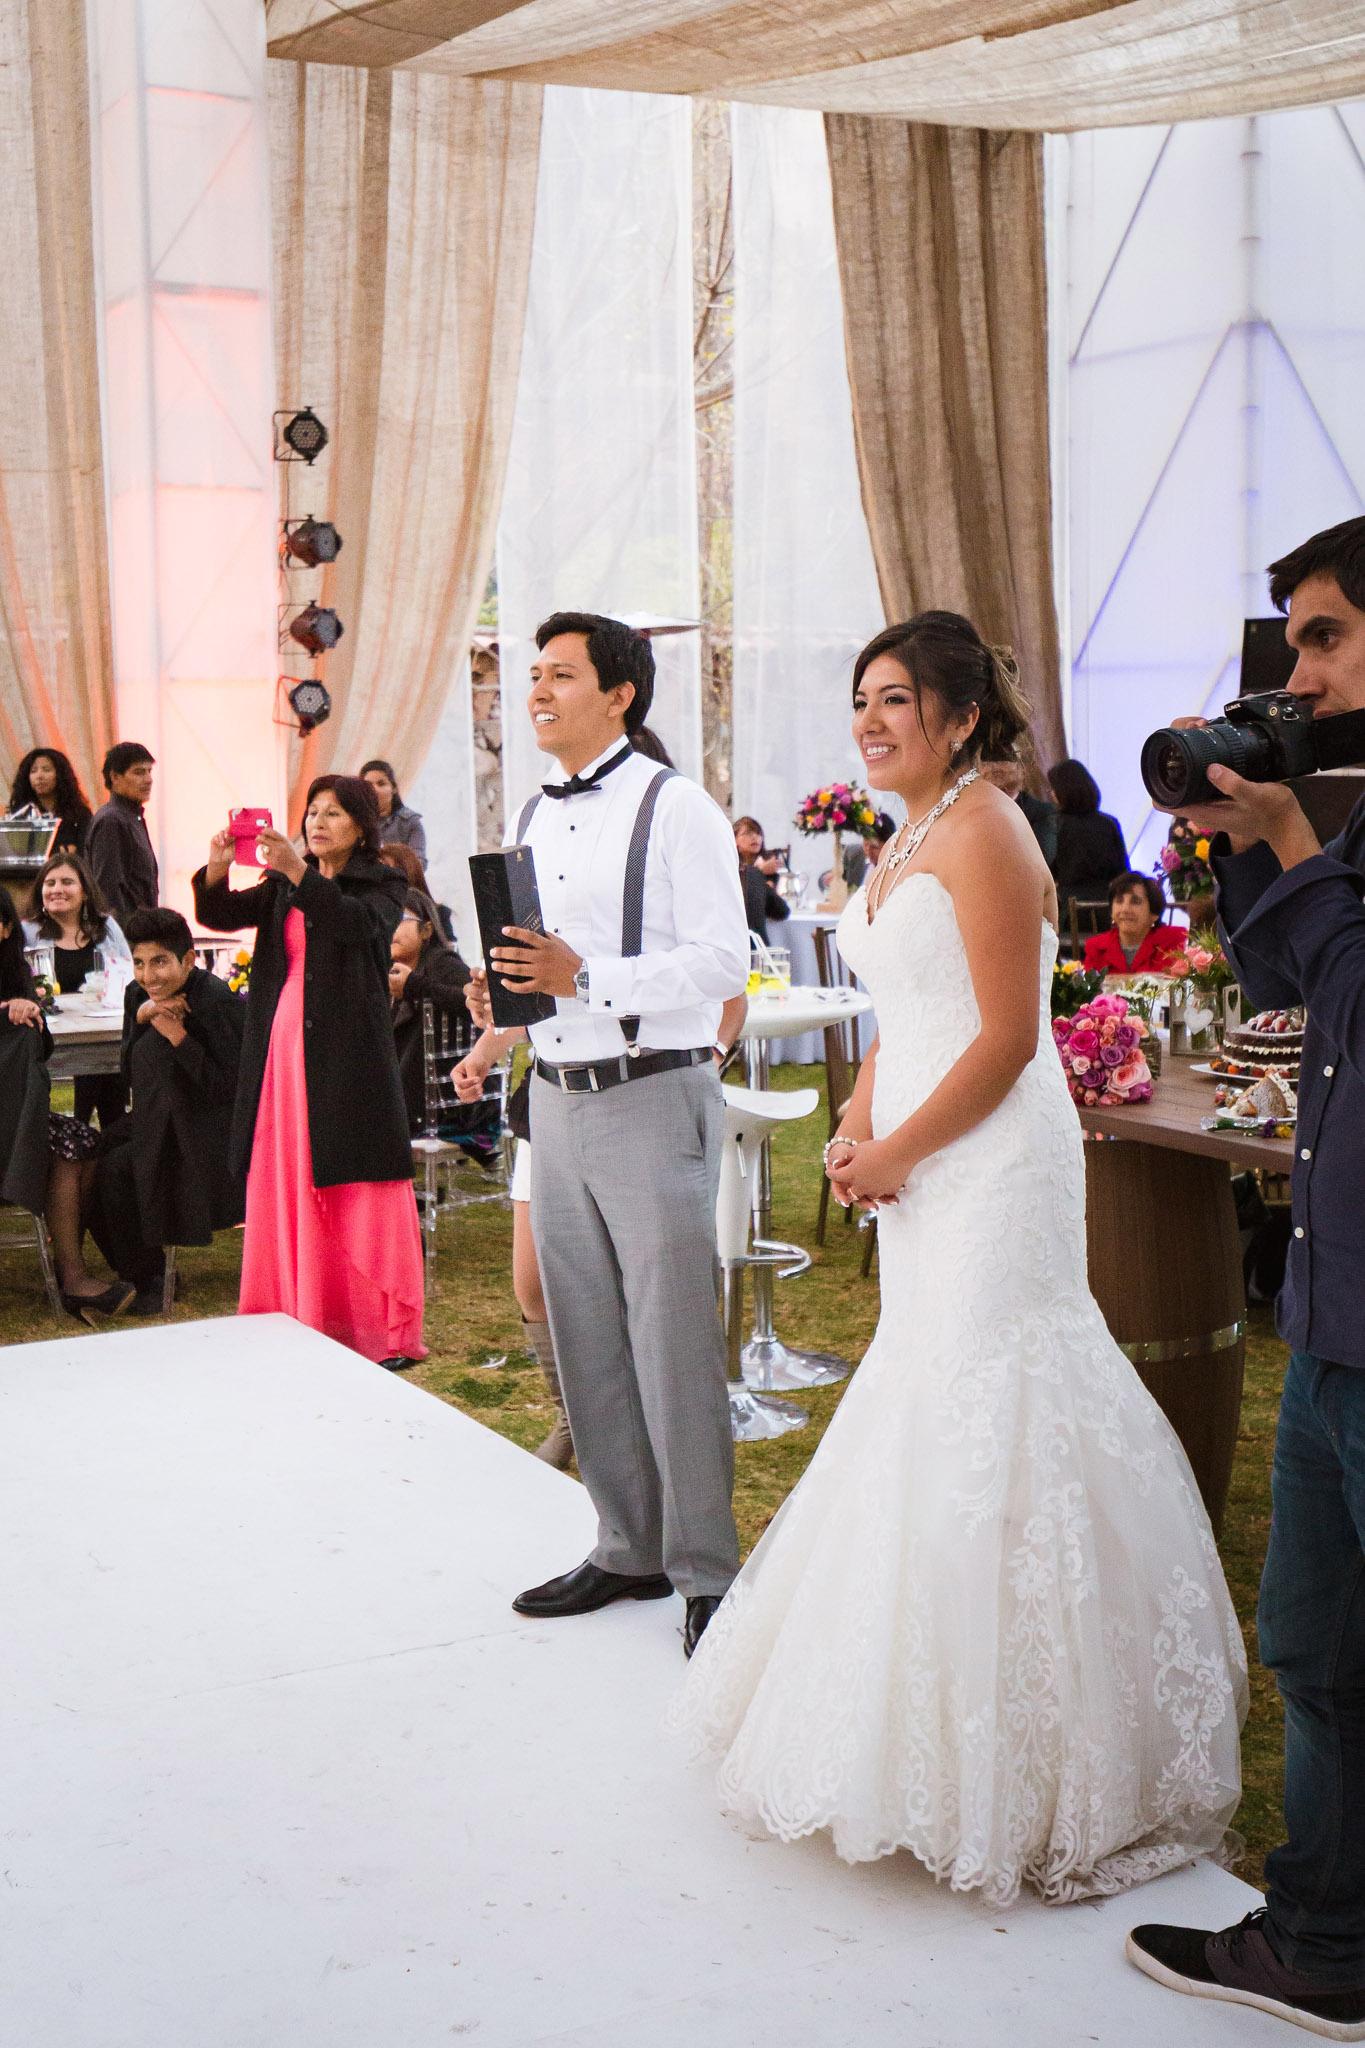 Wedding-Travellers-Destination-Wedding-Peru-Cusco-Hacienda-Sarapampa-Sacred-Valley-toss-beer